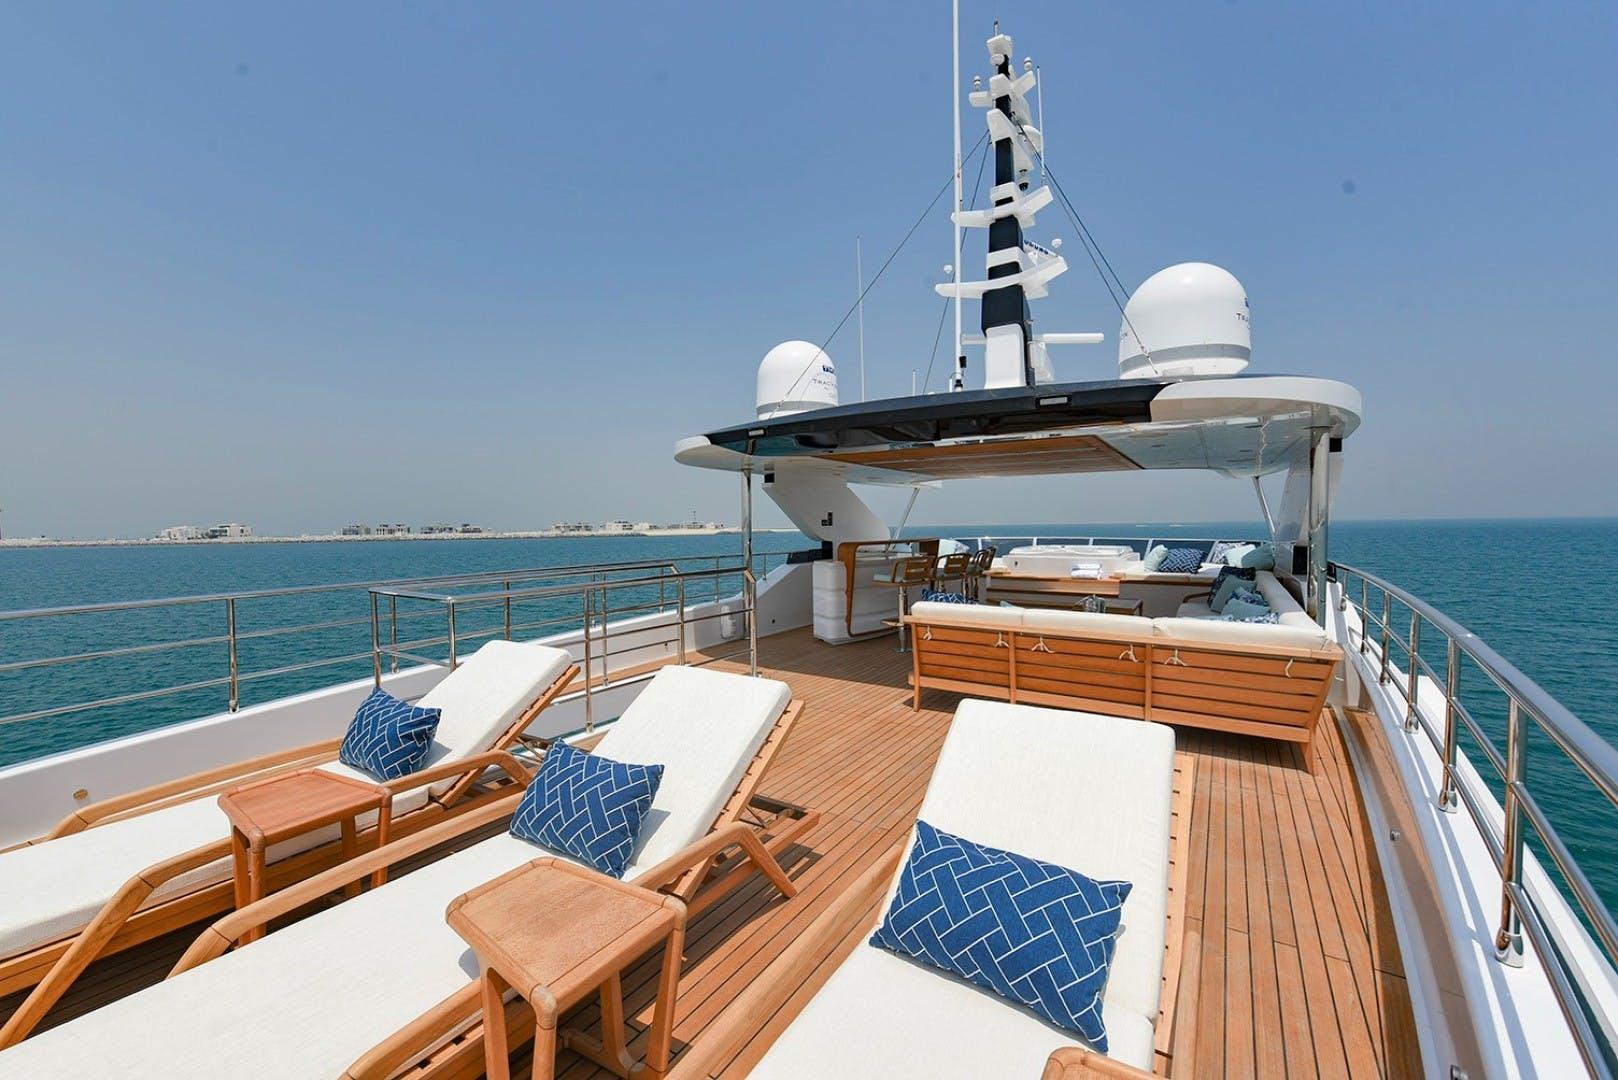 2022 Majesty Yachts 120' Raised Pilothouse MAJESTY 120 | Picture 3 of 39